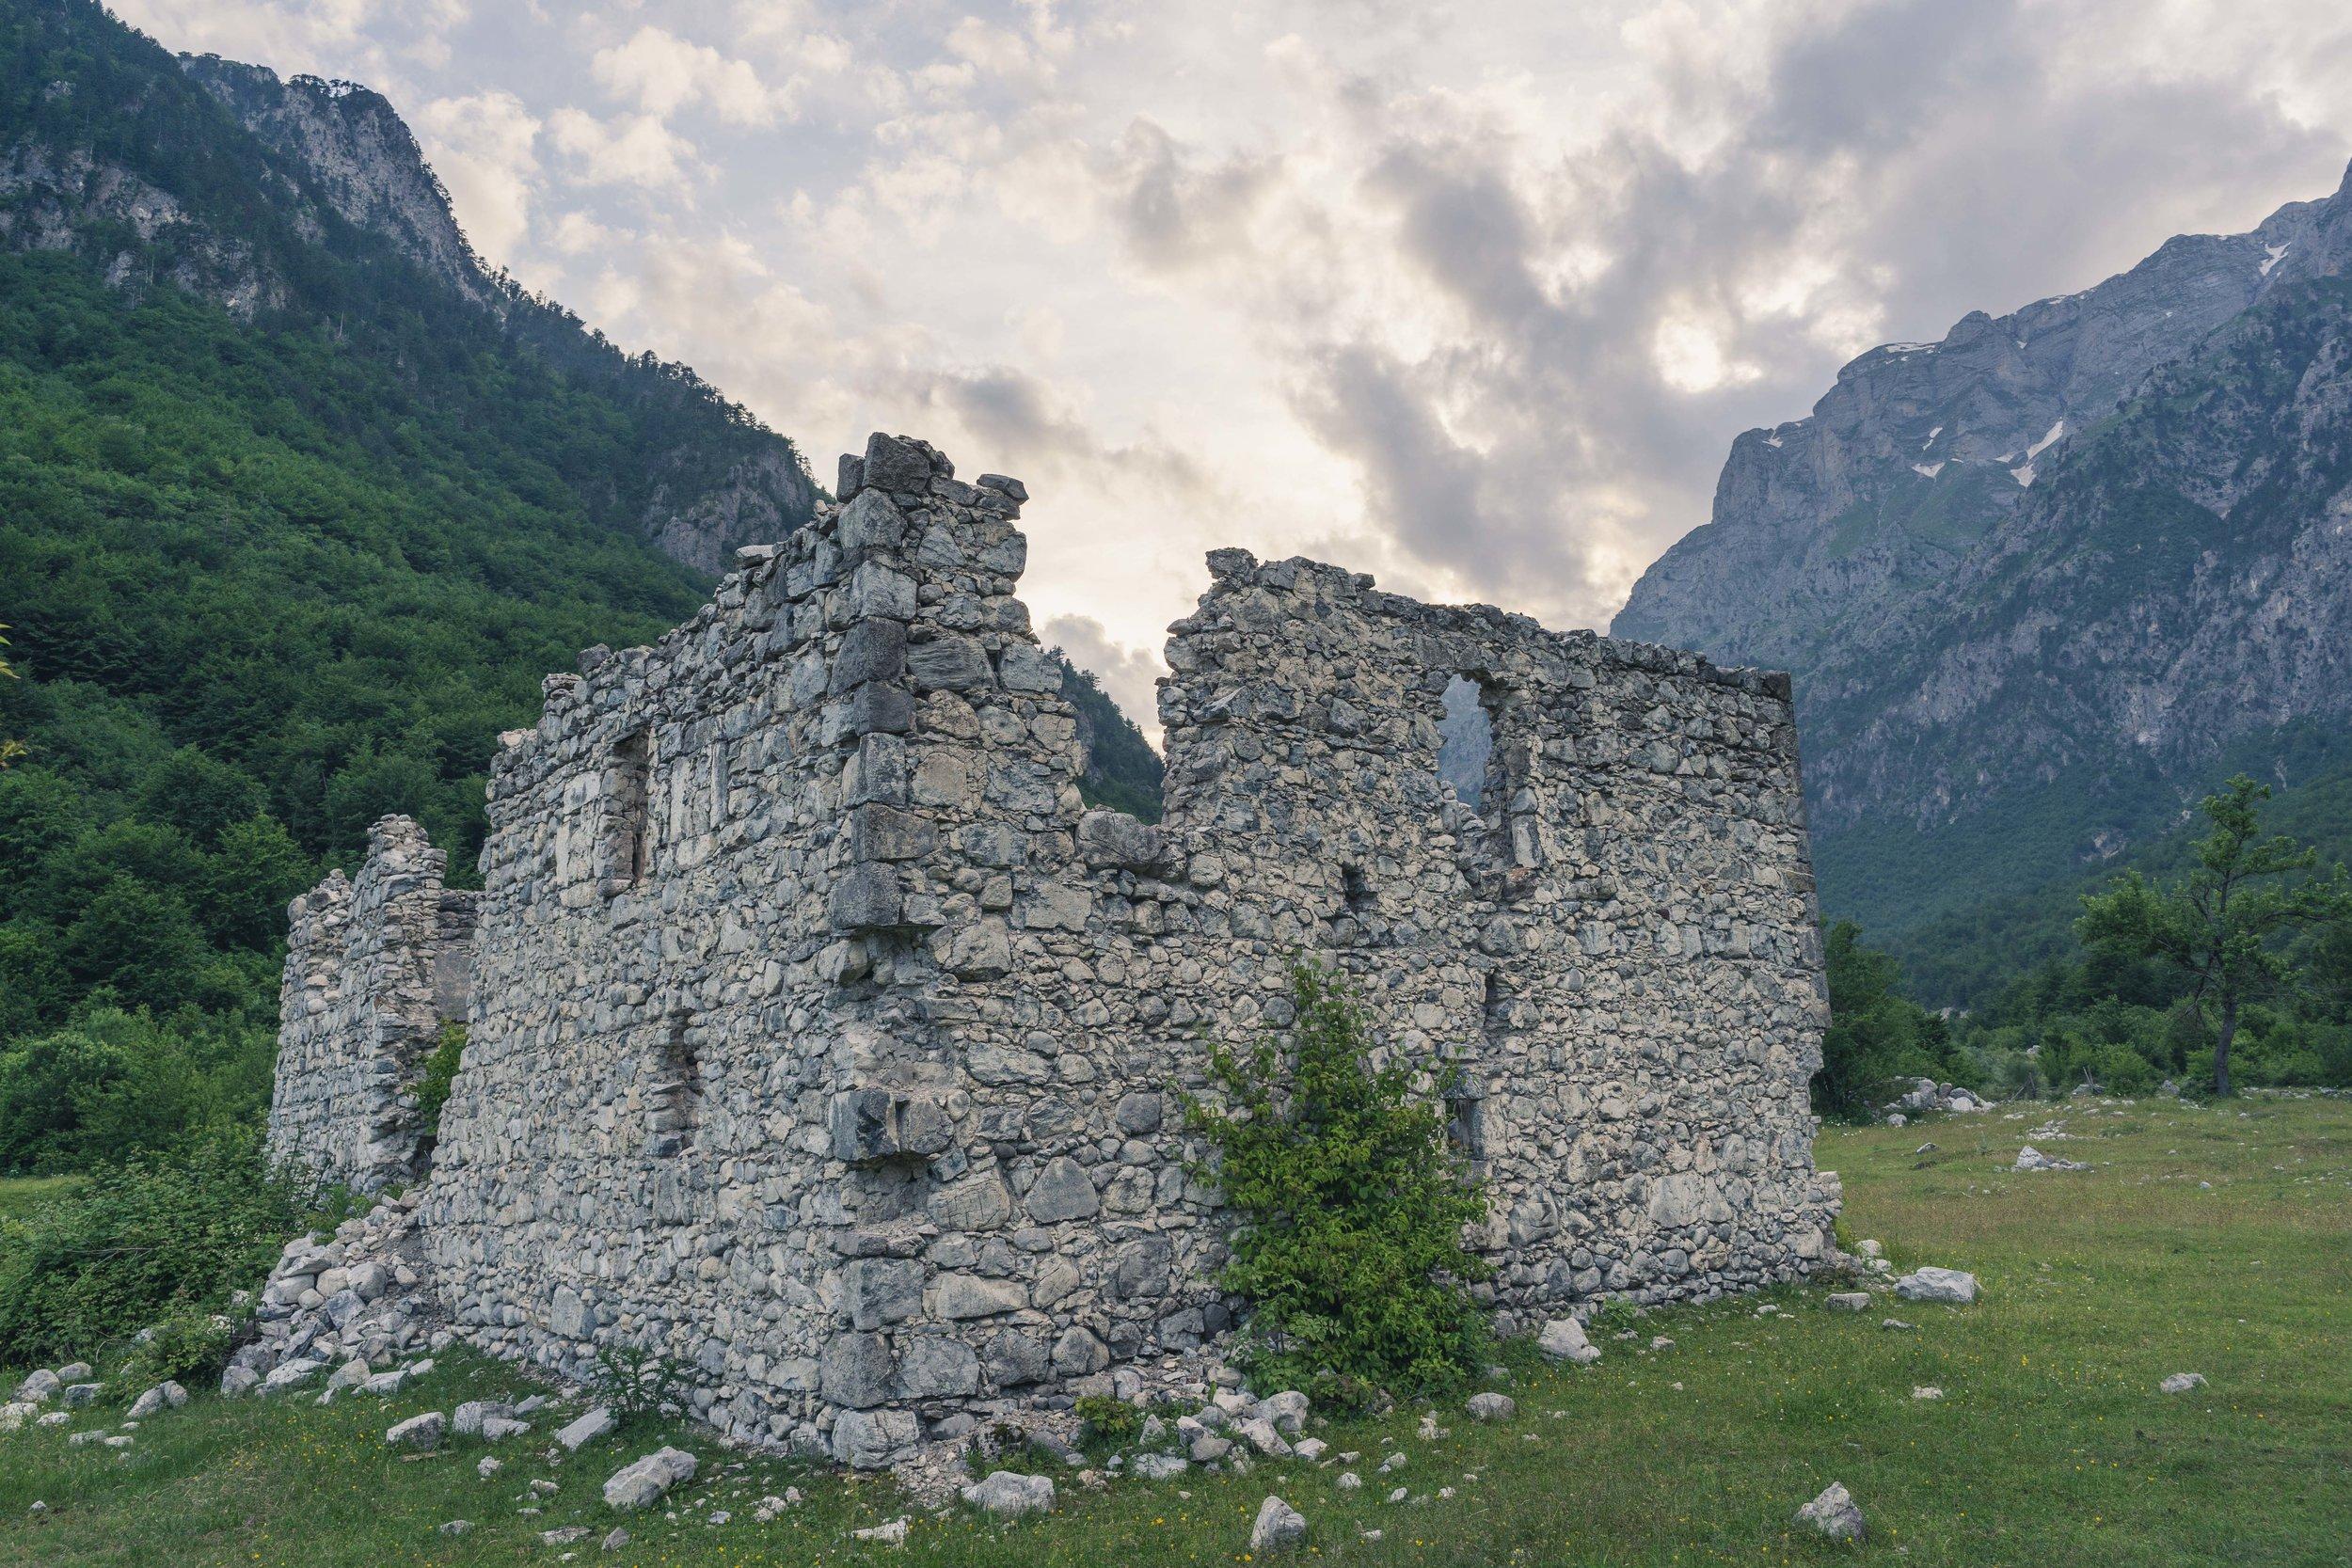 Leftovers of the Malësia, Valbona Valley